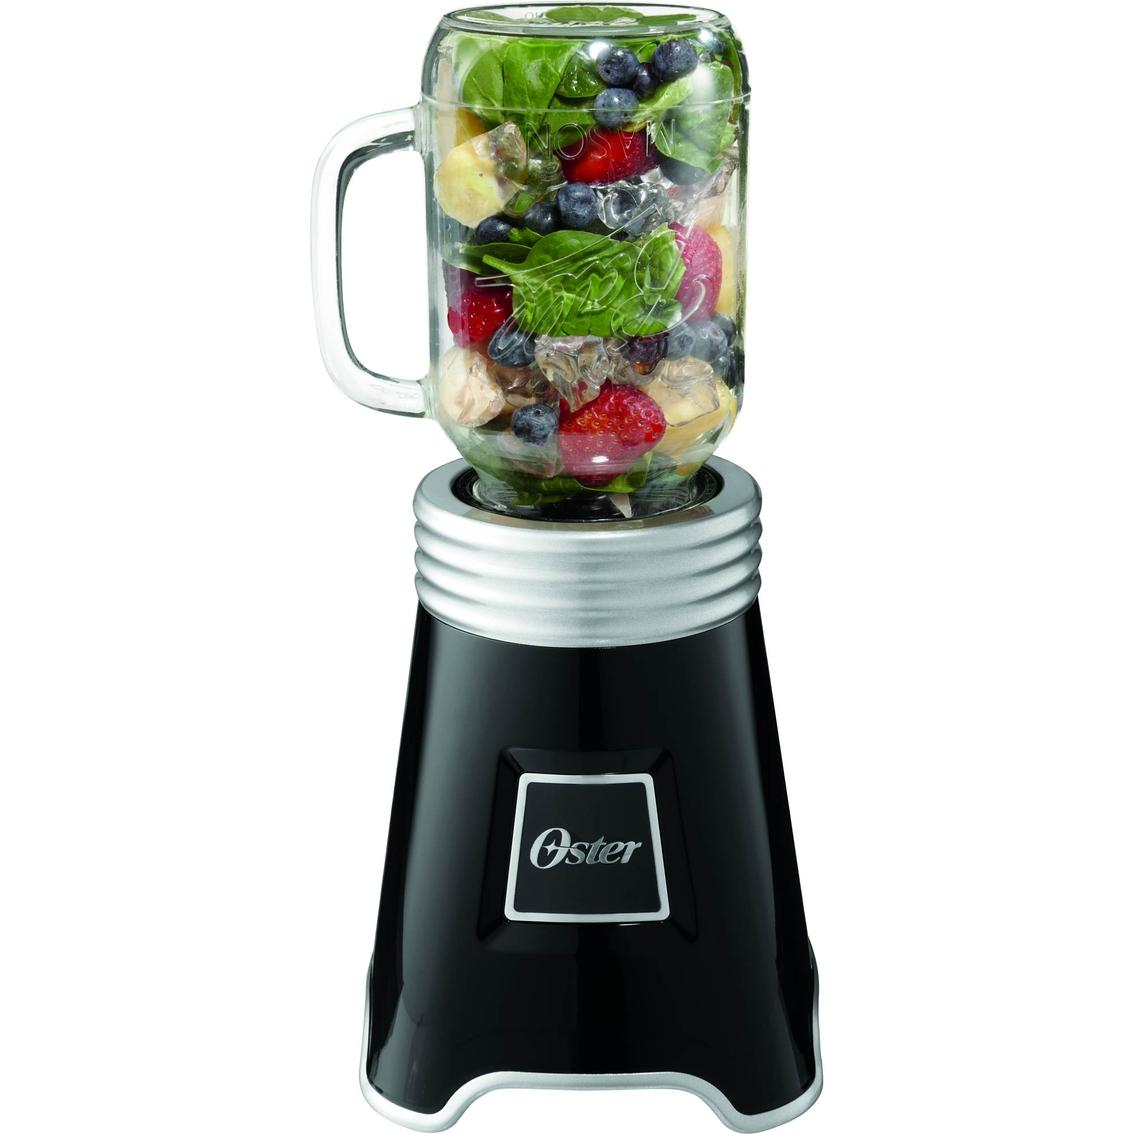 Uncategorized Oster Mixers Small Kitchen Appliances oster freshblendn go mason jar blender blenders home 1007